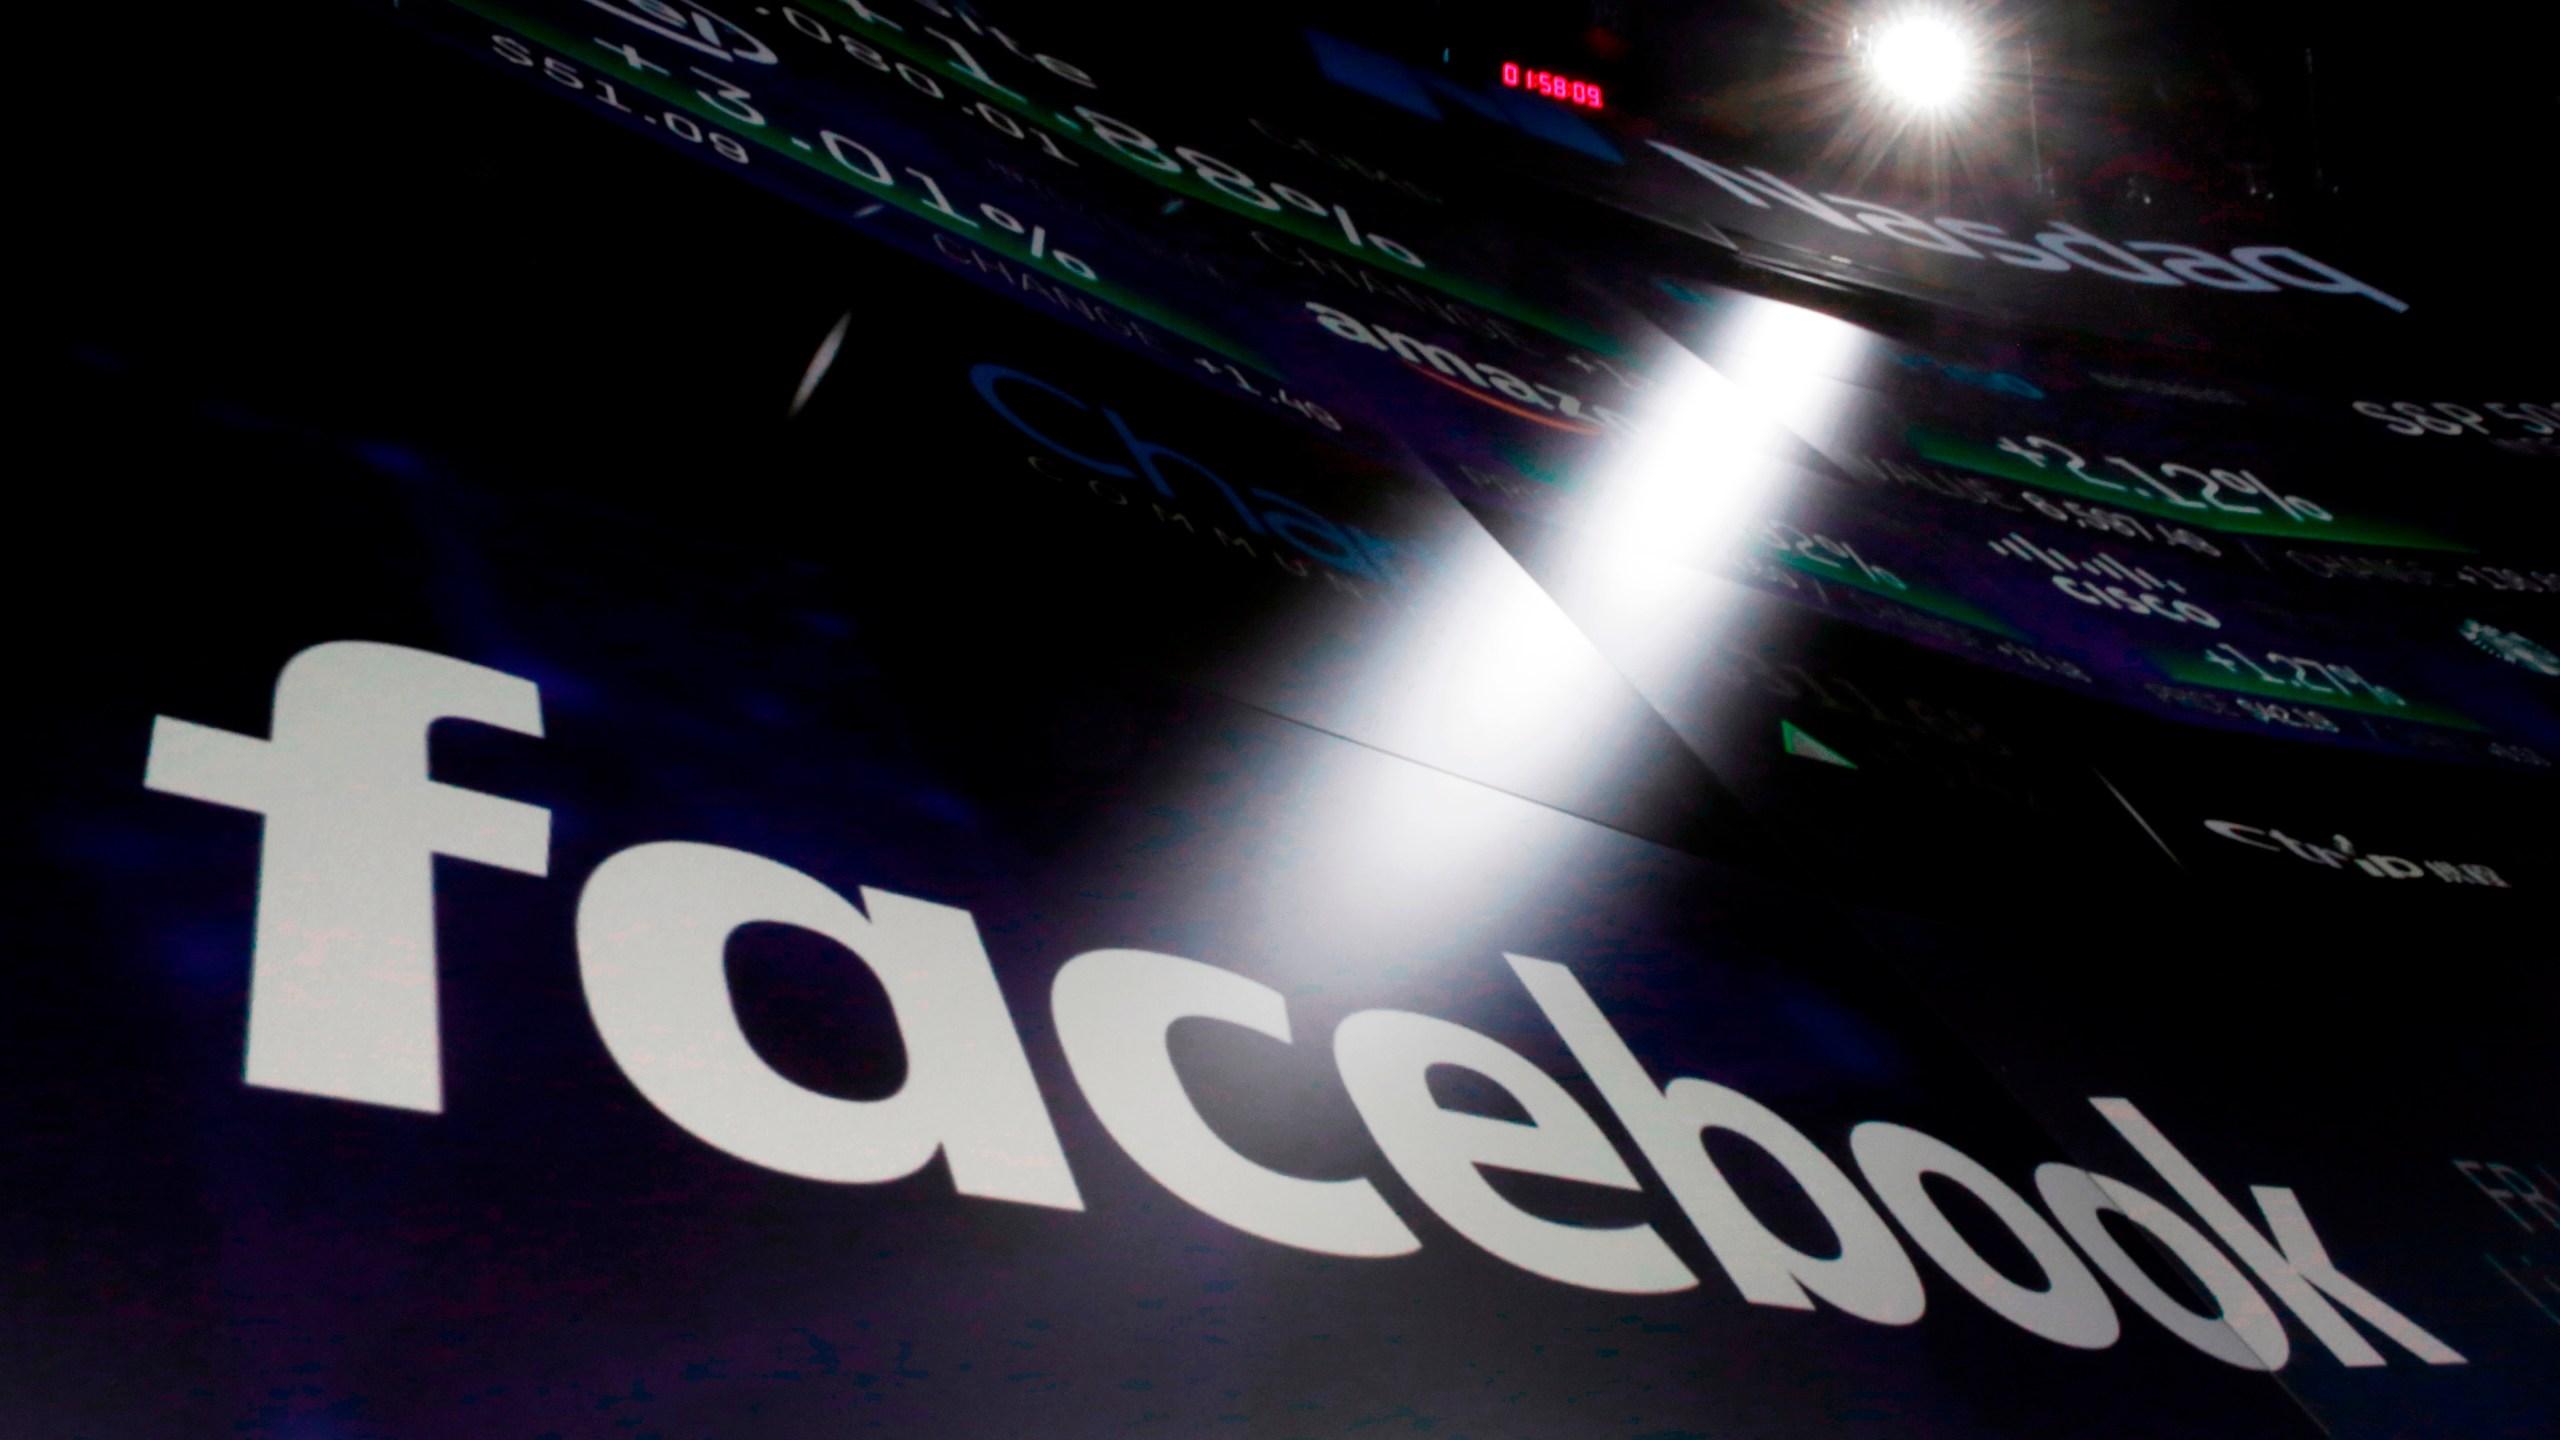 Facebook_Housing_Discrimination_16504-159532.jpg63346076